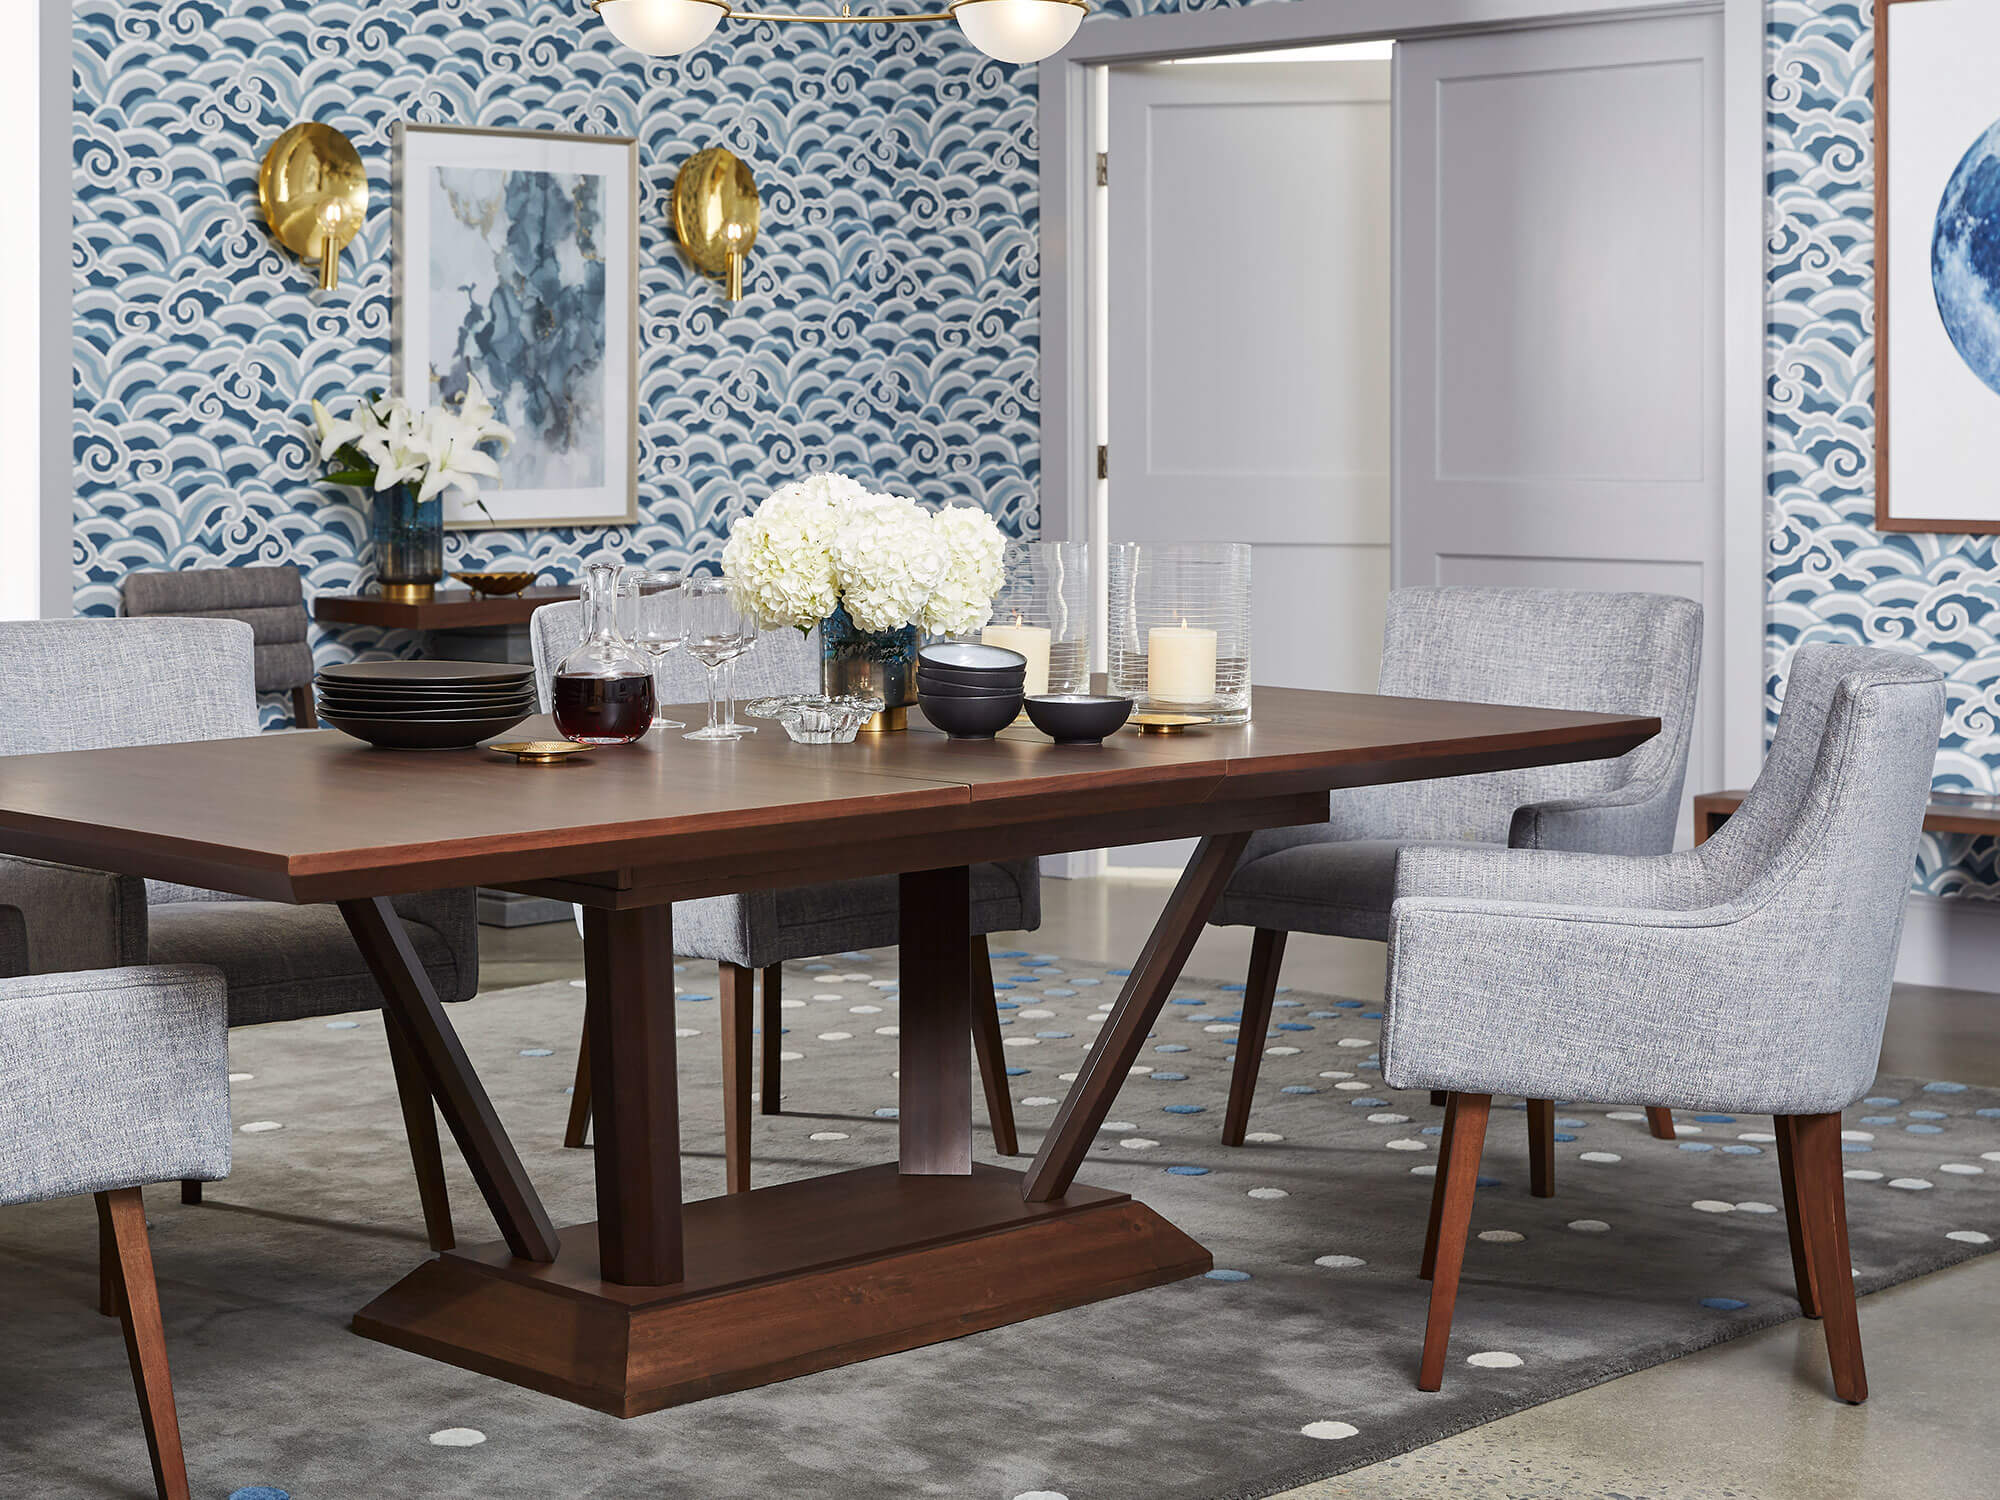 Boulevard Extension Dining Table, Palliser Dining Room Furniture